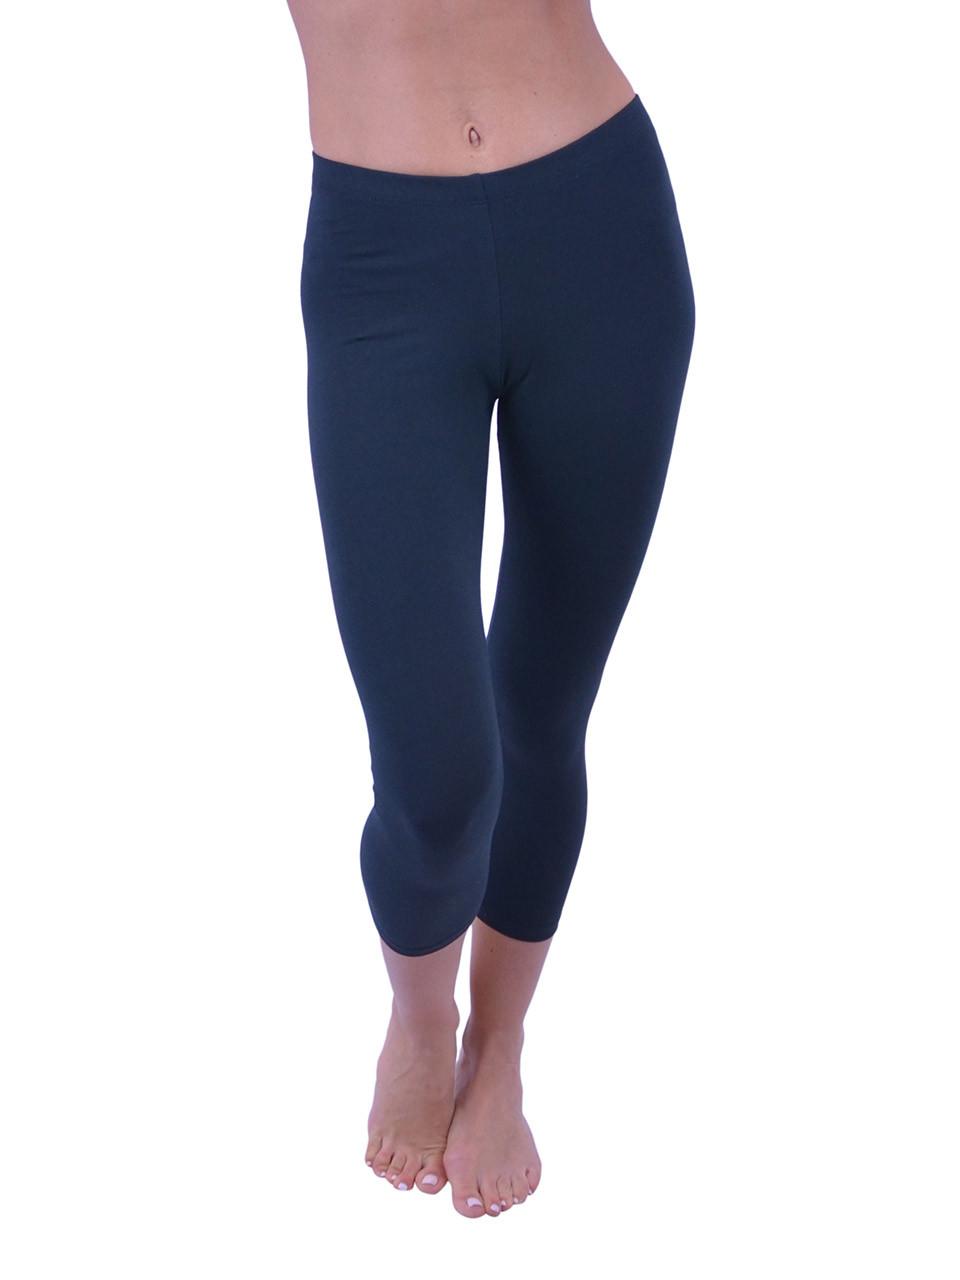 67fef210d570a Vivian s Fashions Capri Leggings - Cotton (Junior and Junior Plus Sizes) - Vivian s  Fashions